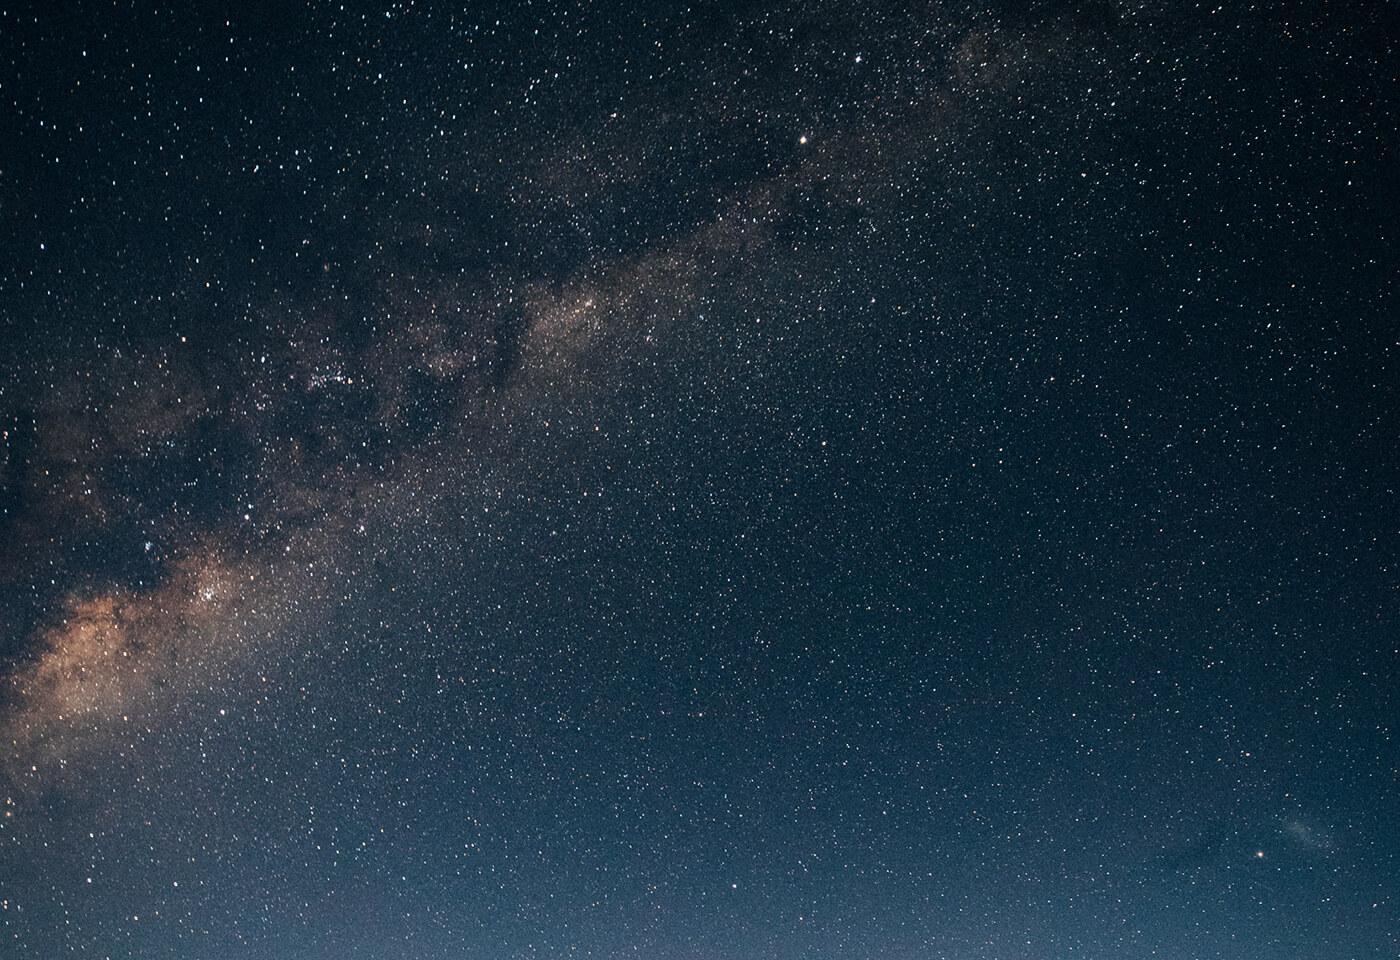 Image of astro